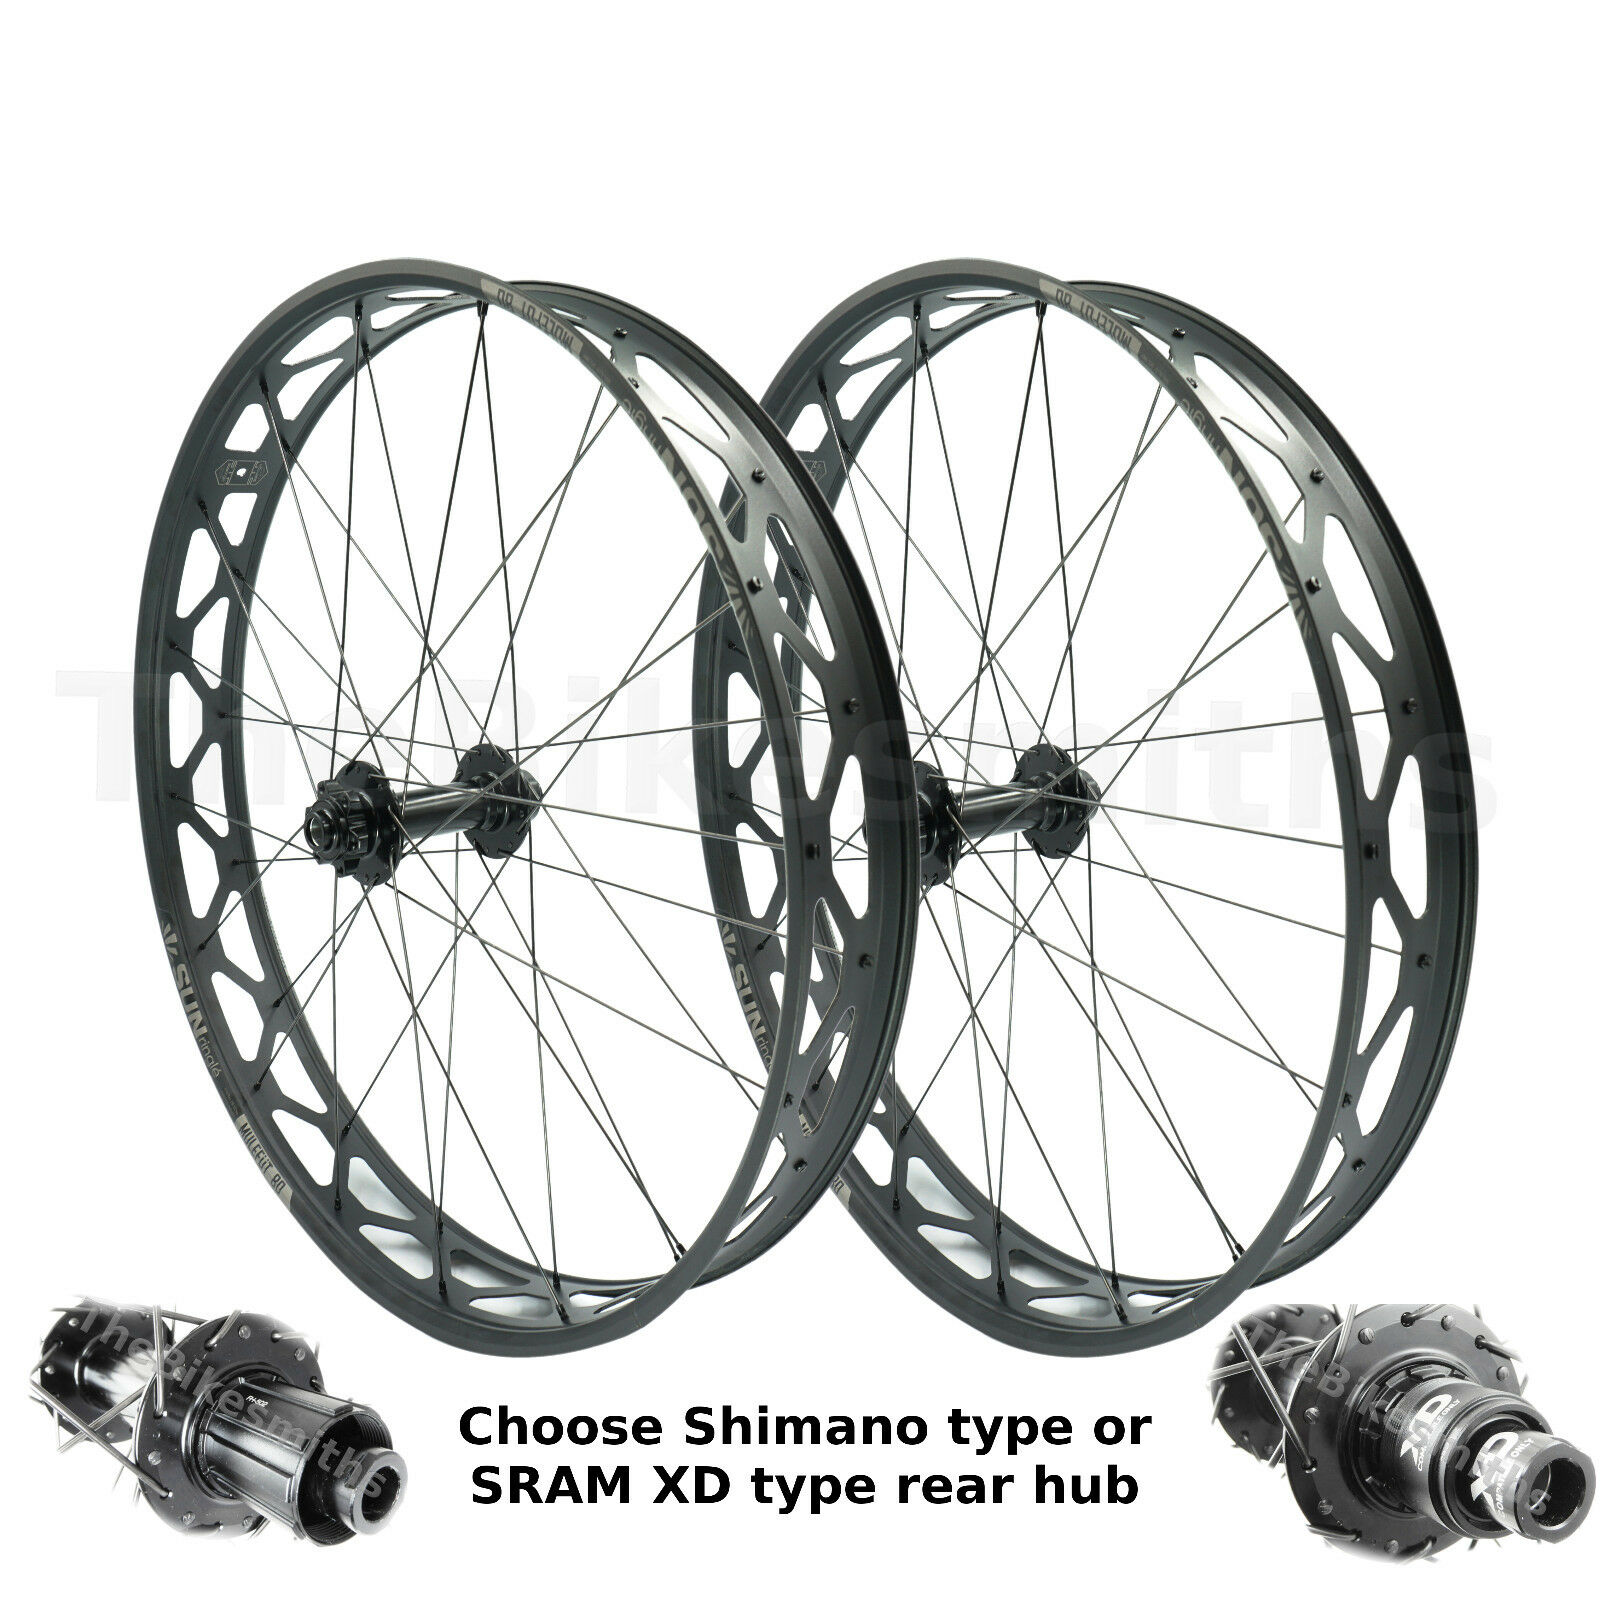 Sun Ringle MULEFUT Thru-Axle 15x150 Front & 12x197 Rear Fat Bike Wheelset